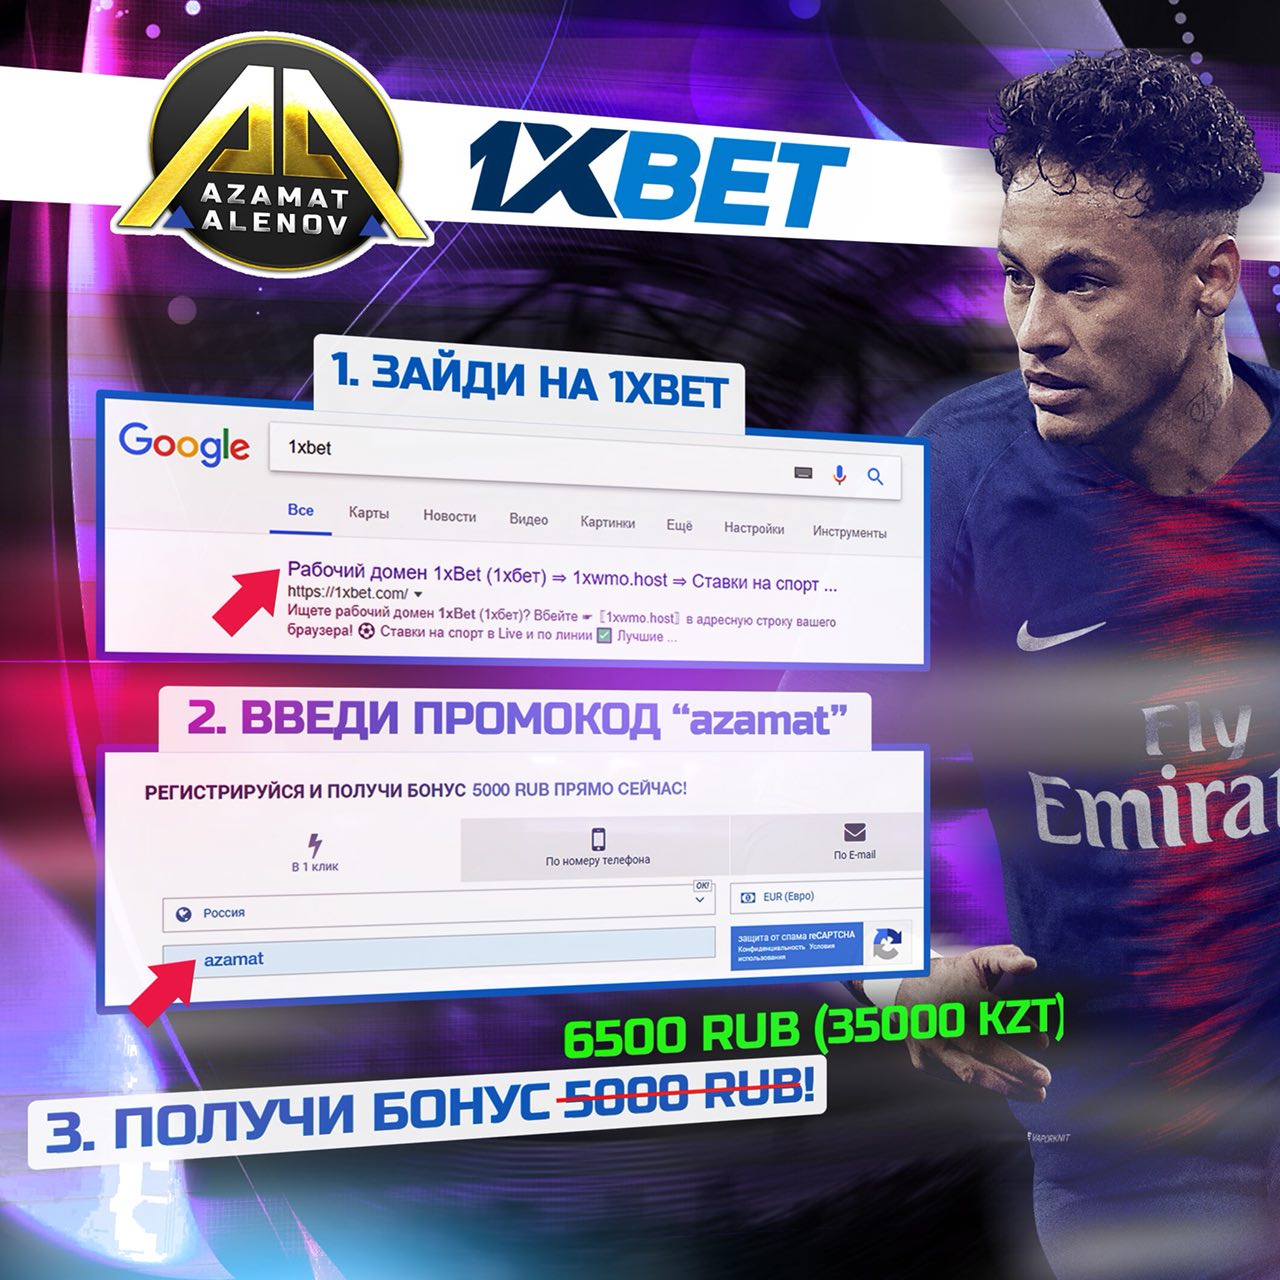 Ставки на матчи прогнозы ставки на спорт онлайн на русские деньги